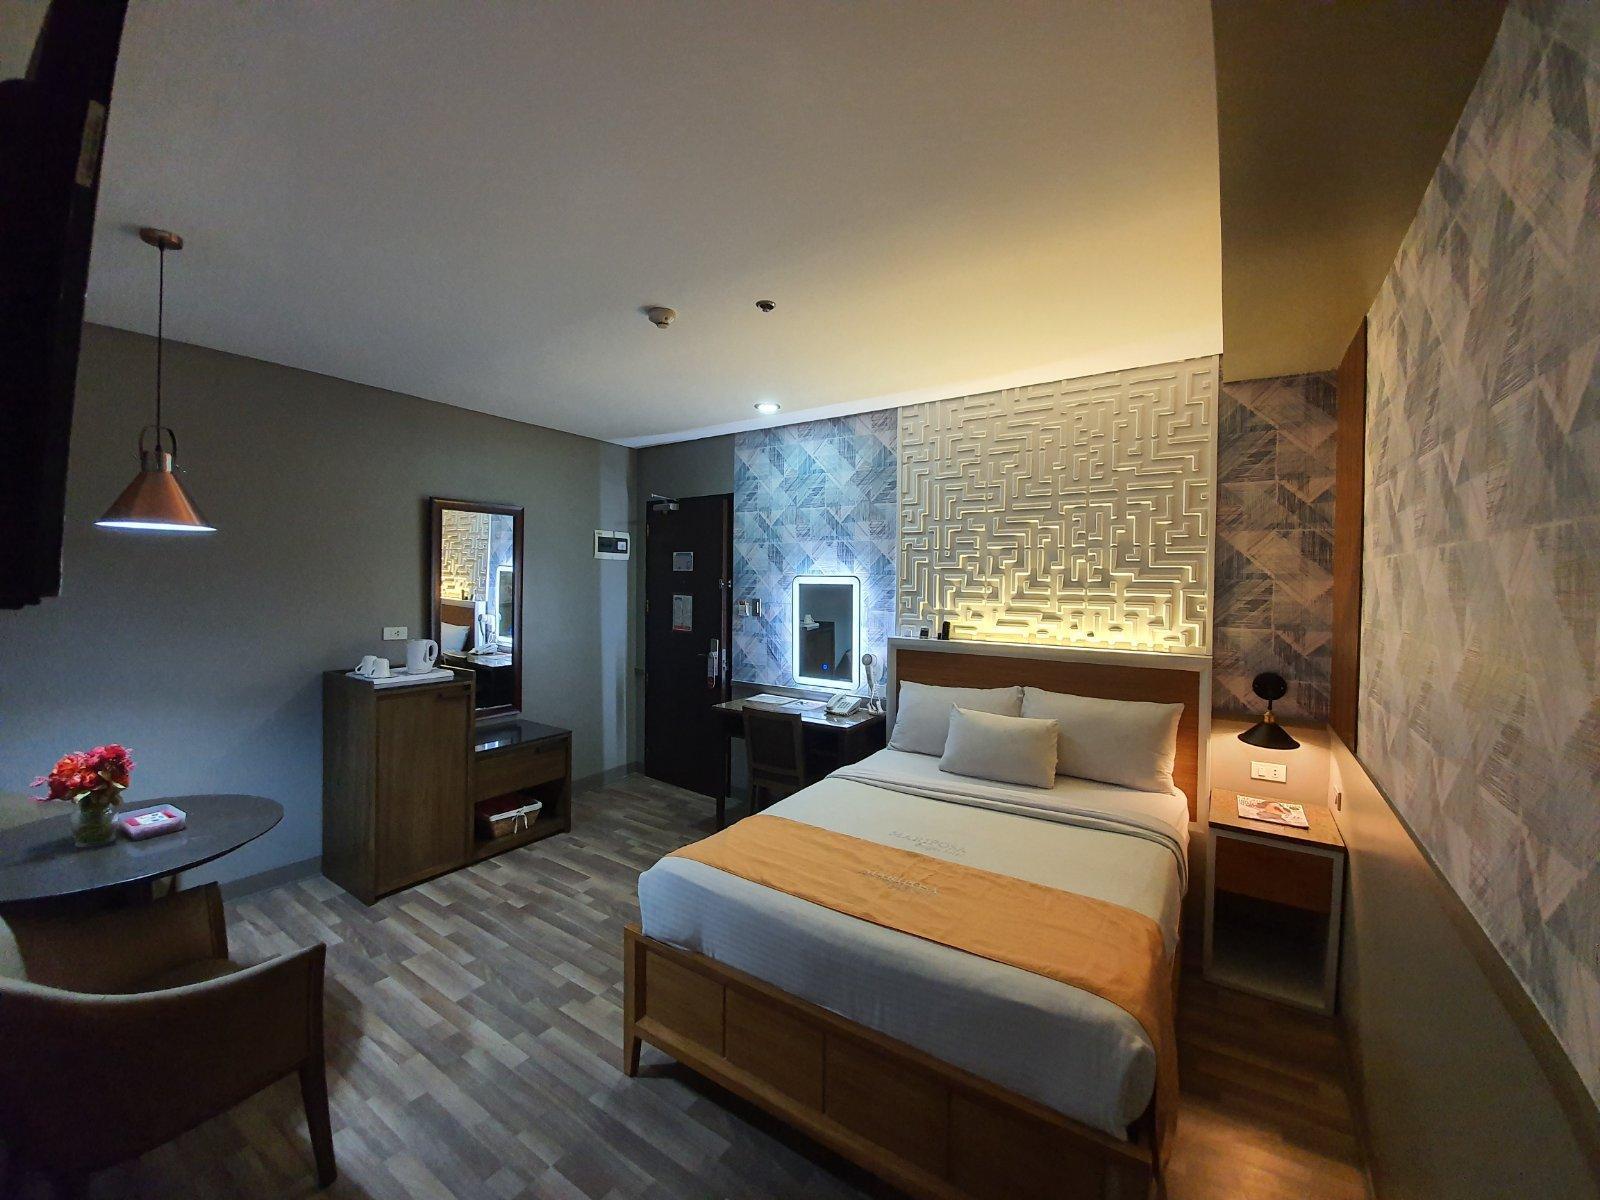 MODA Mariposa Budget Hotel   Anonas